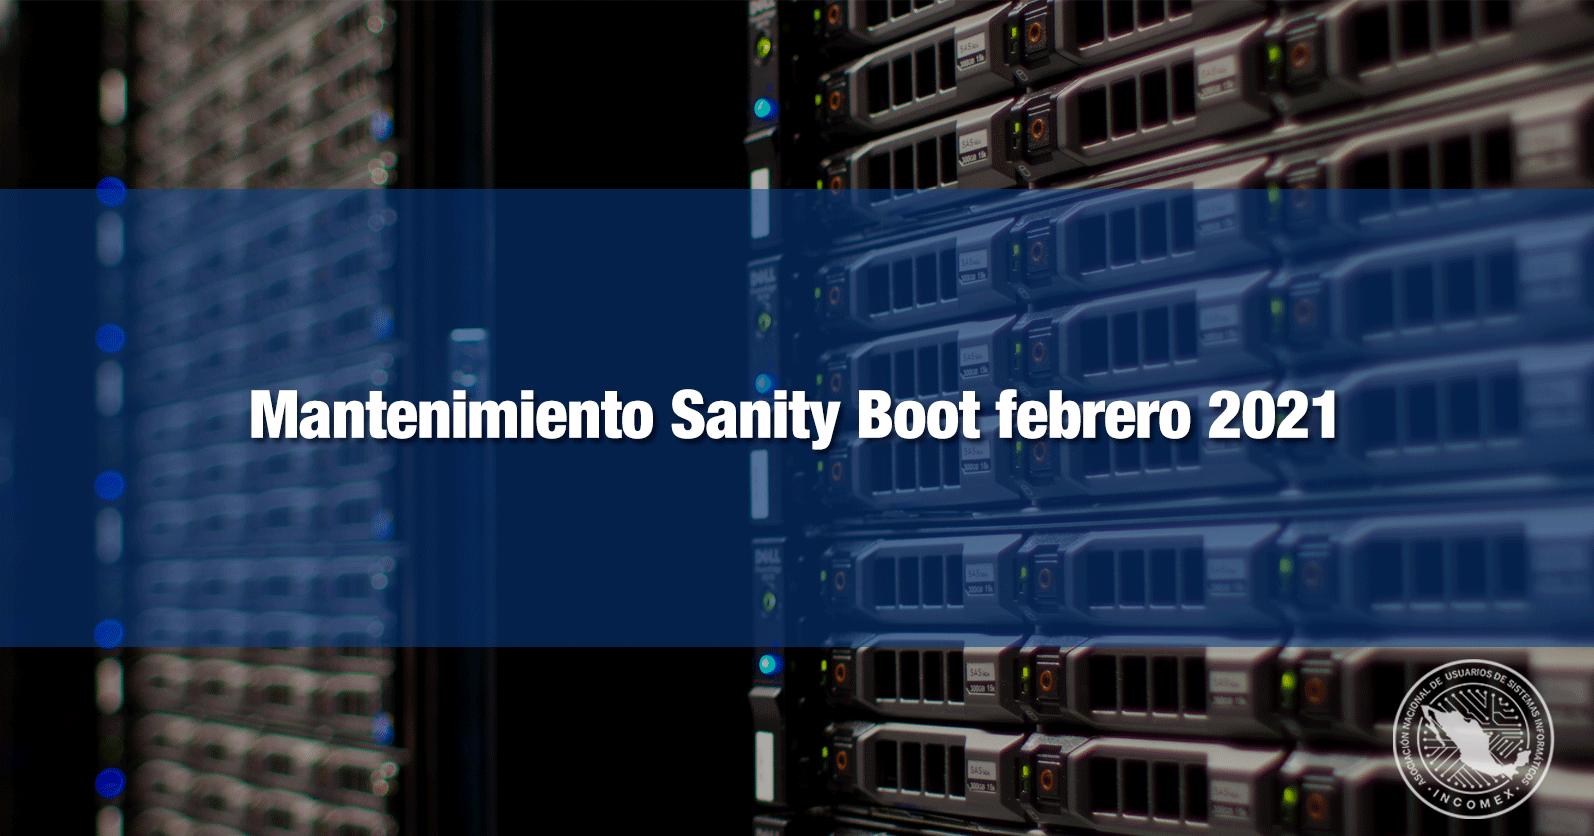 Mantenimiento Sanity Boot febrero 2021